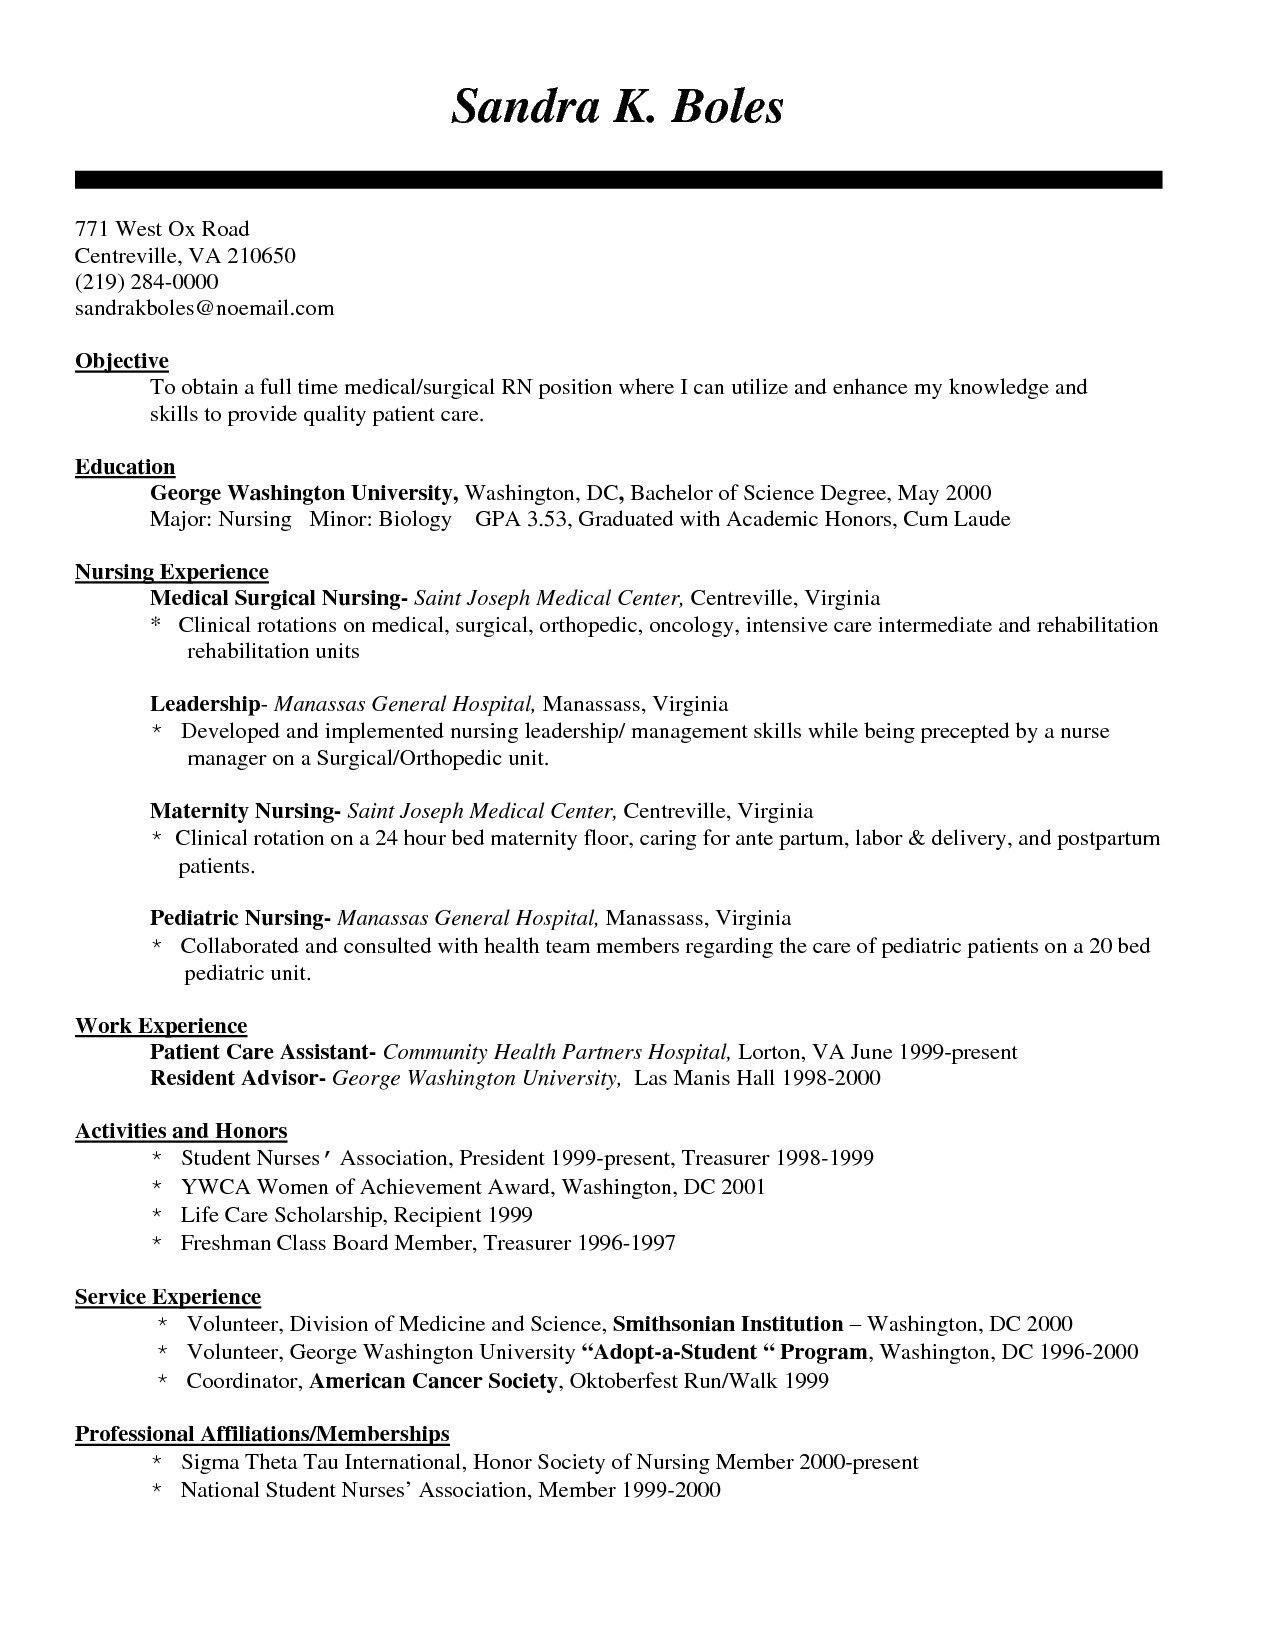 Writing Tips To Make Resume Objective With Examples Registered Nurse Resume Nursing Resume Template Nursing Resume